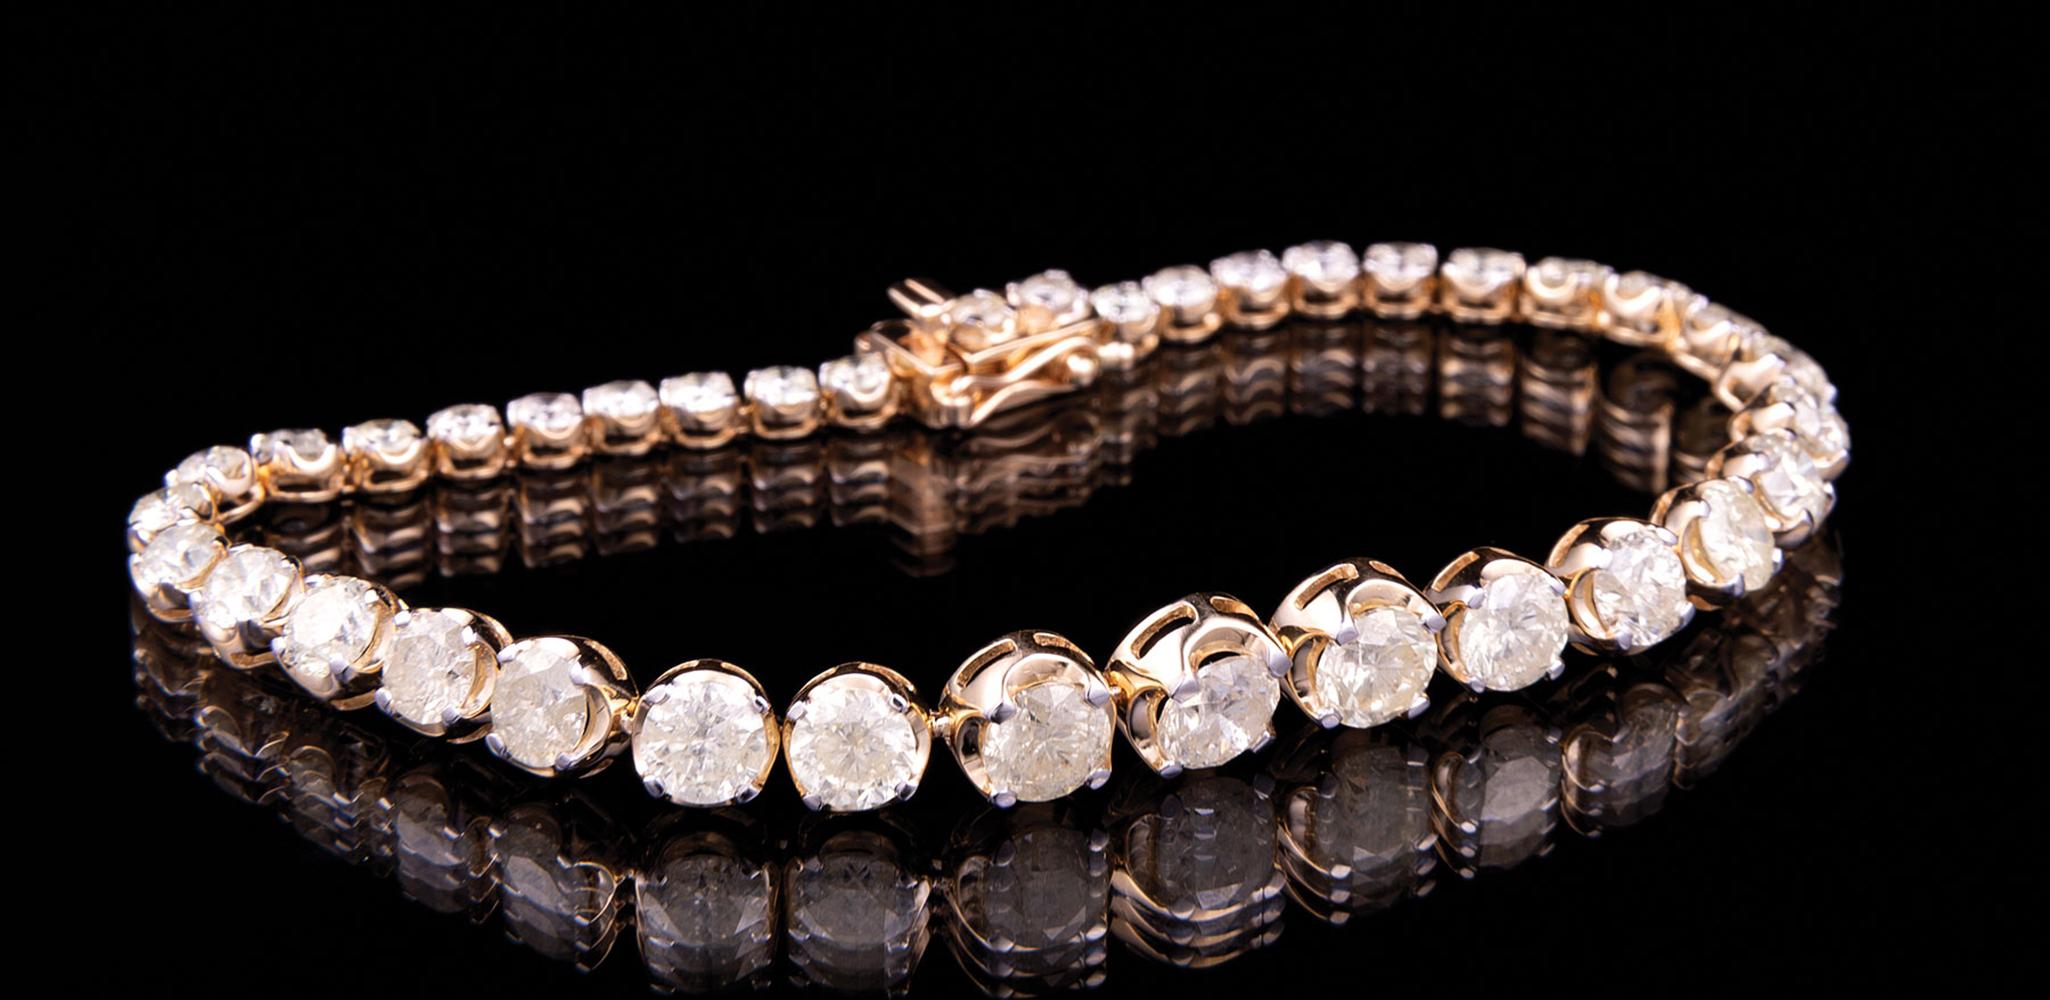 Lot 571 - 18 kt. Yellow Gold and Graduated Diamond Bracelet , 37 round brilliant cut diamonds, 2.5-5.6 mm,